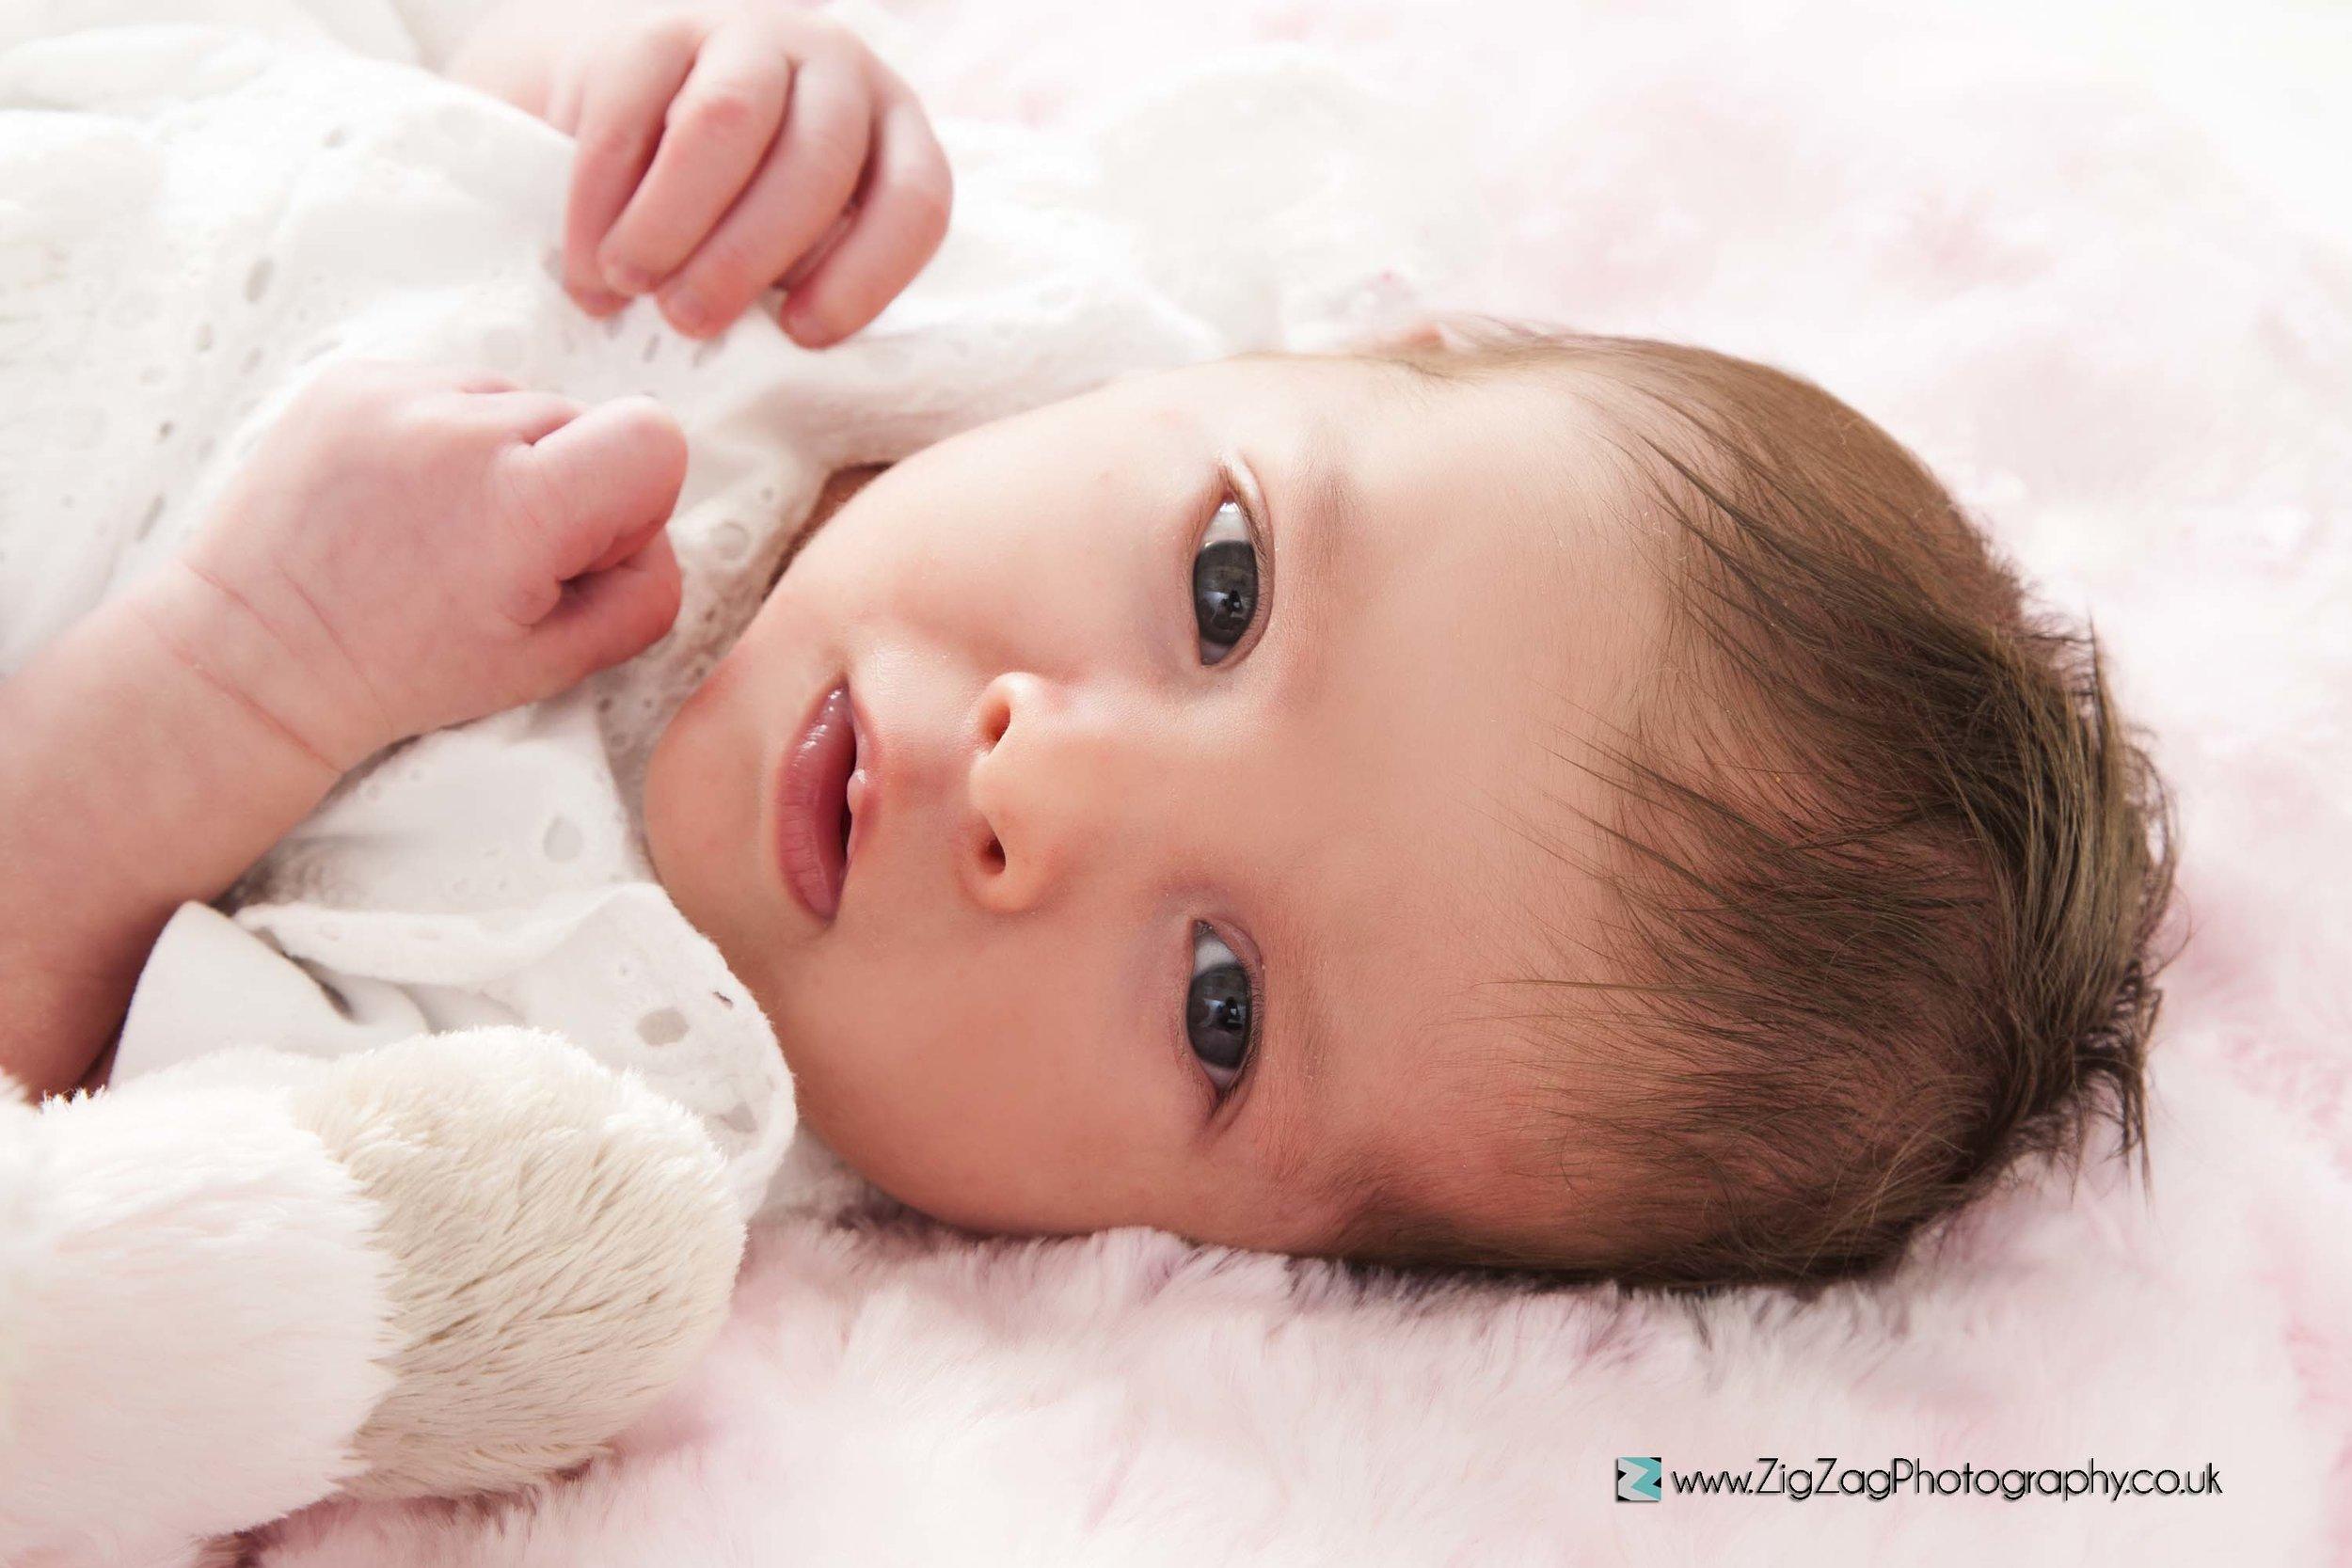 newborn-photography-photoshoot-studio-leicester-cute-baby-props-pink-fur.jpg